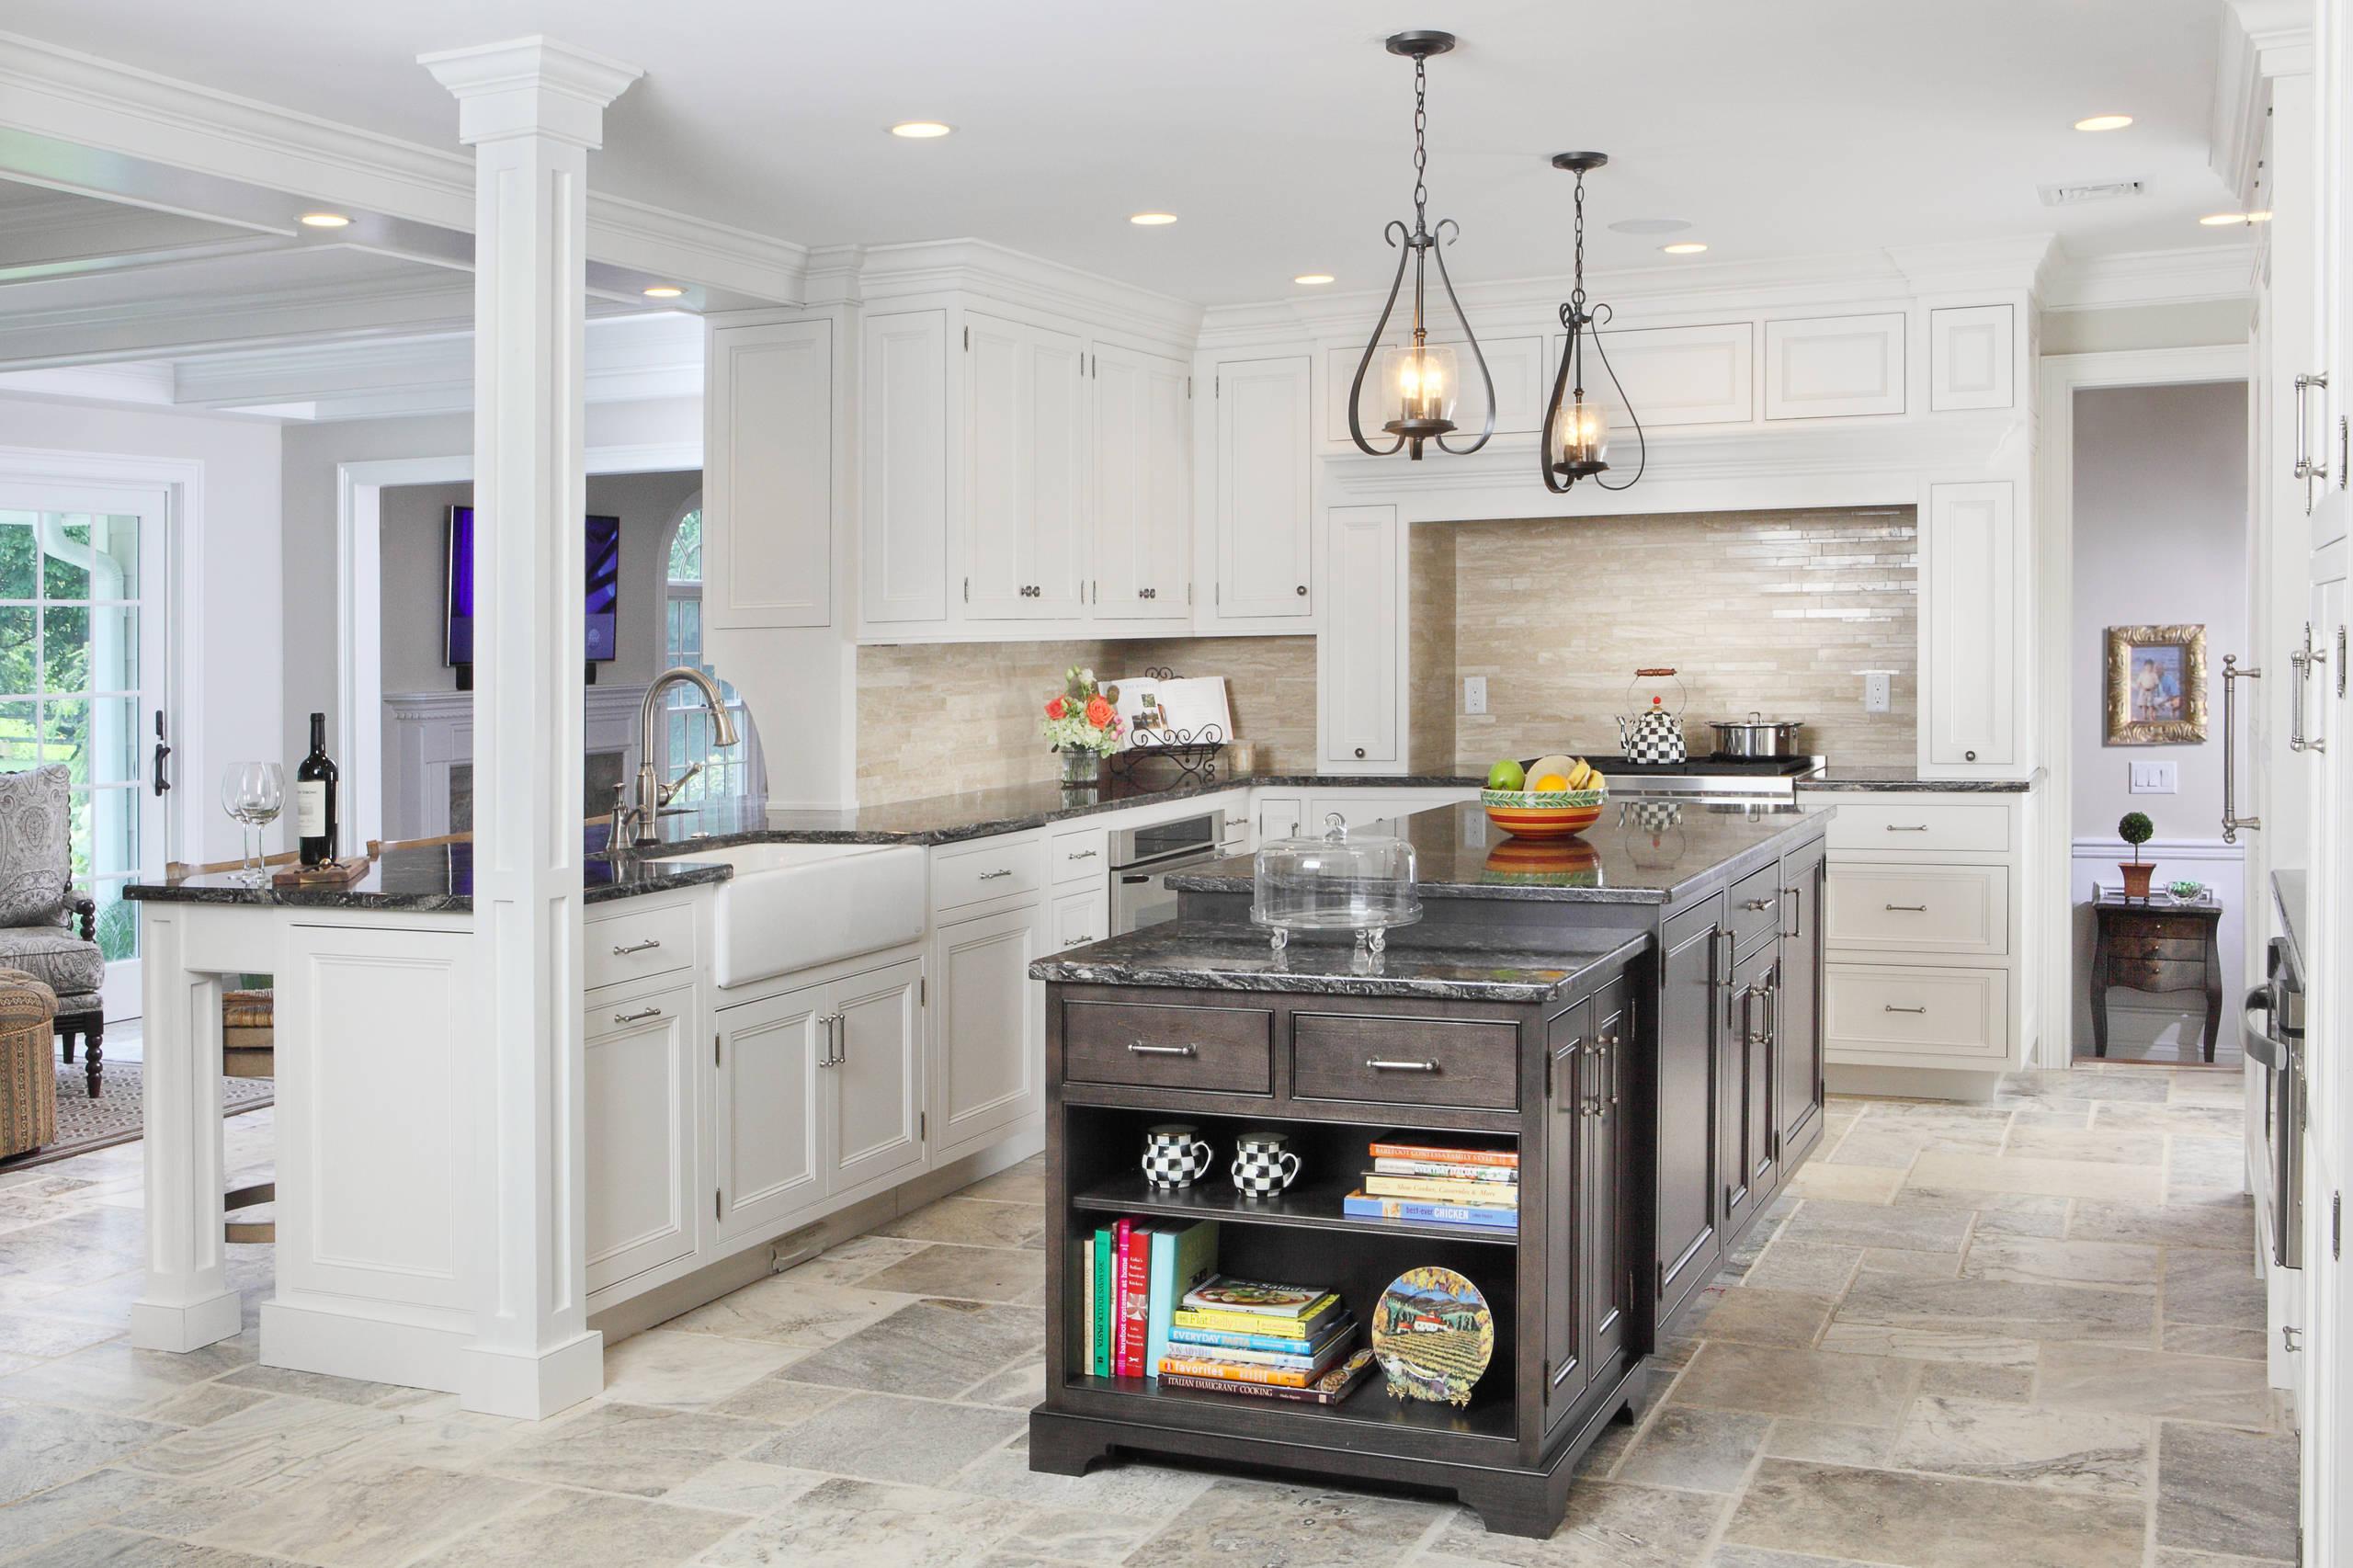 9 Beautiful Travertine Floor Kitchen Pictures & Ideas   July ...